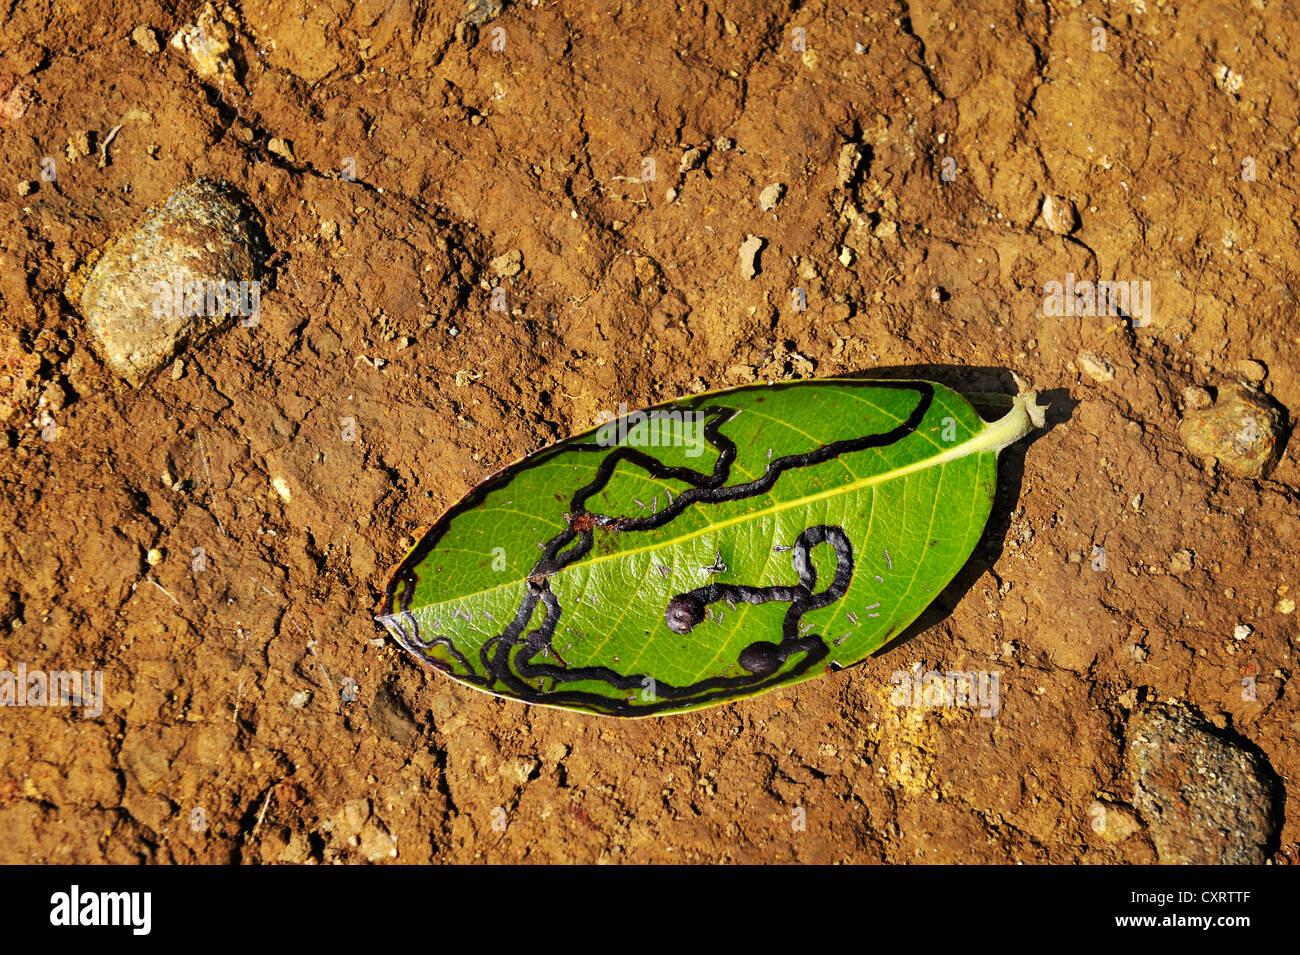 Leaf infested by a pest, Guanacaste province, Rincon de la Vieja National Park, Costa Rica, Central America - Stock Image